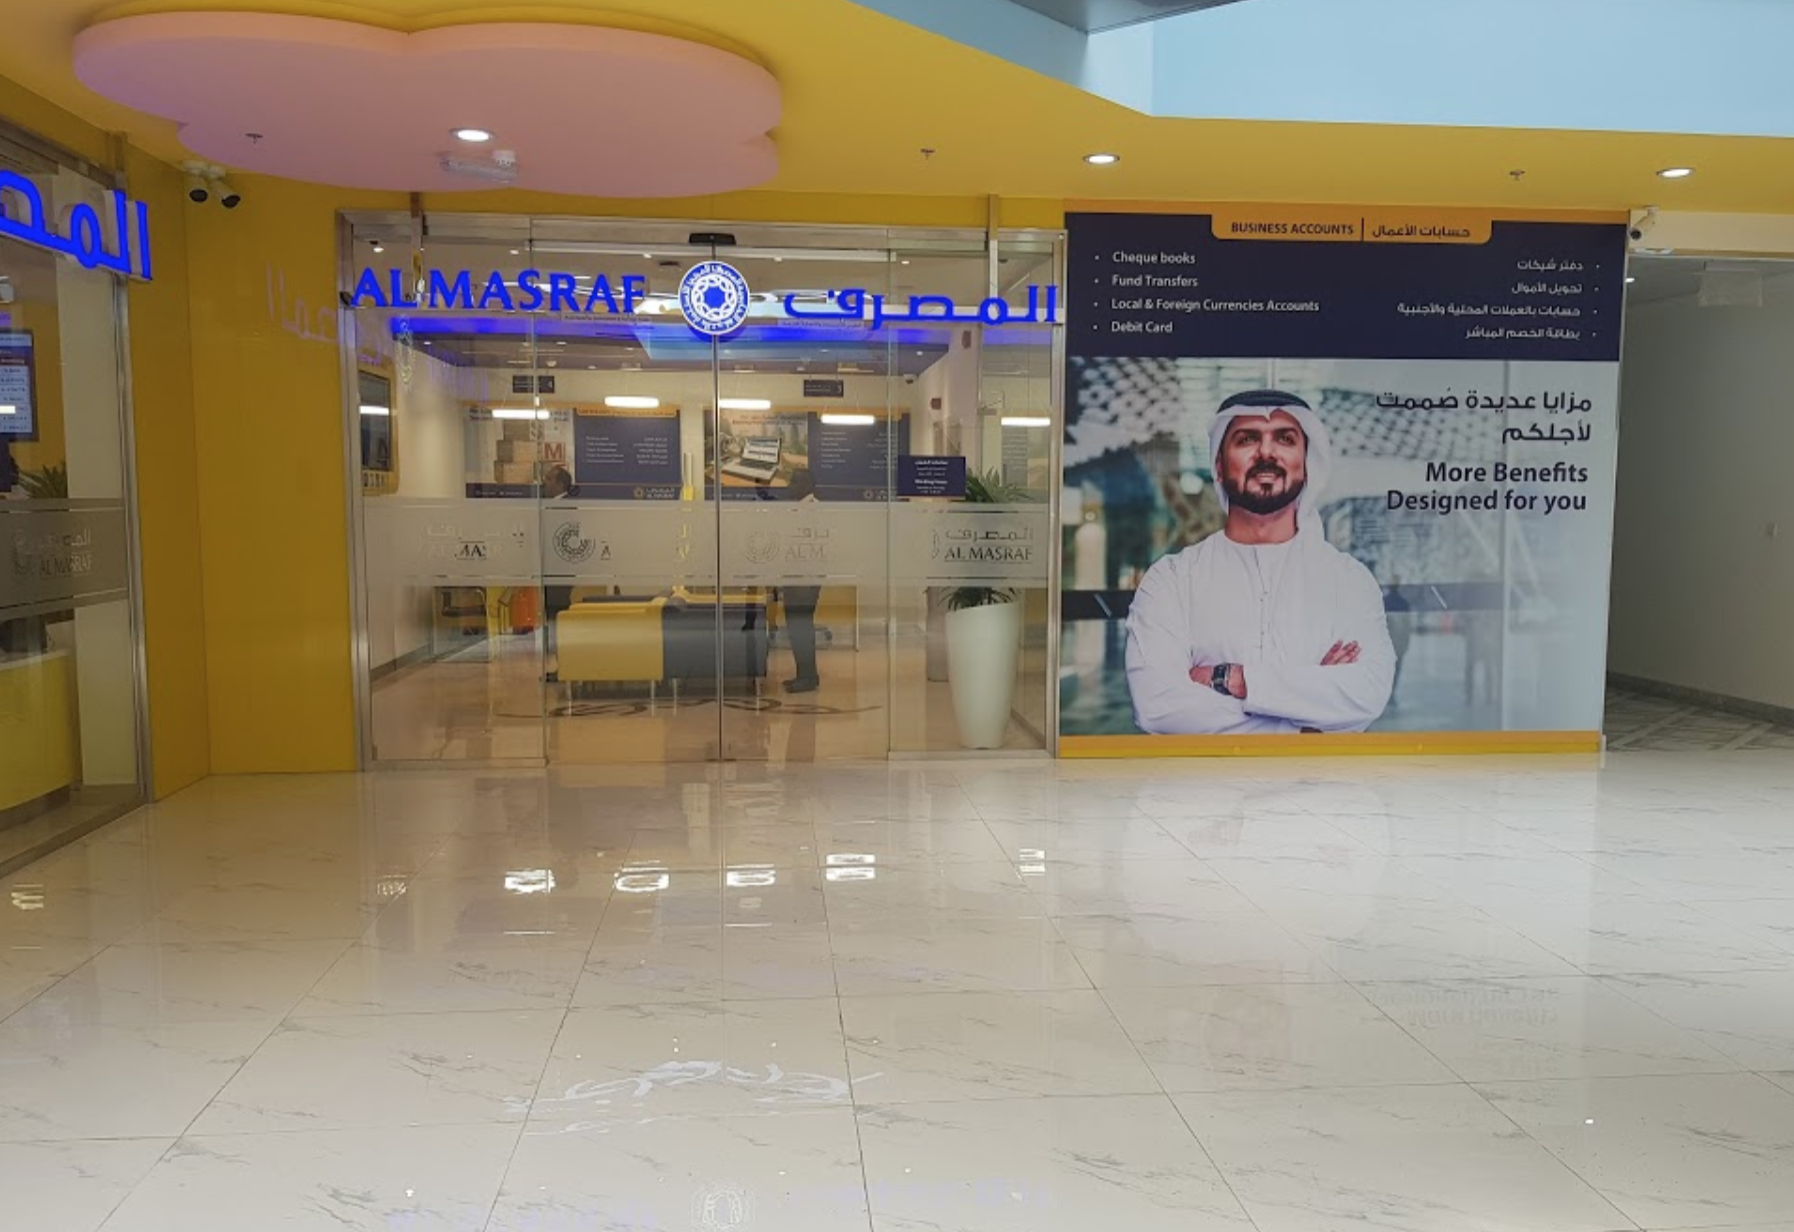 Al Masraf - Musaffah Branch